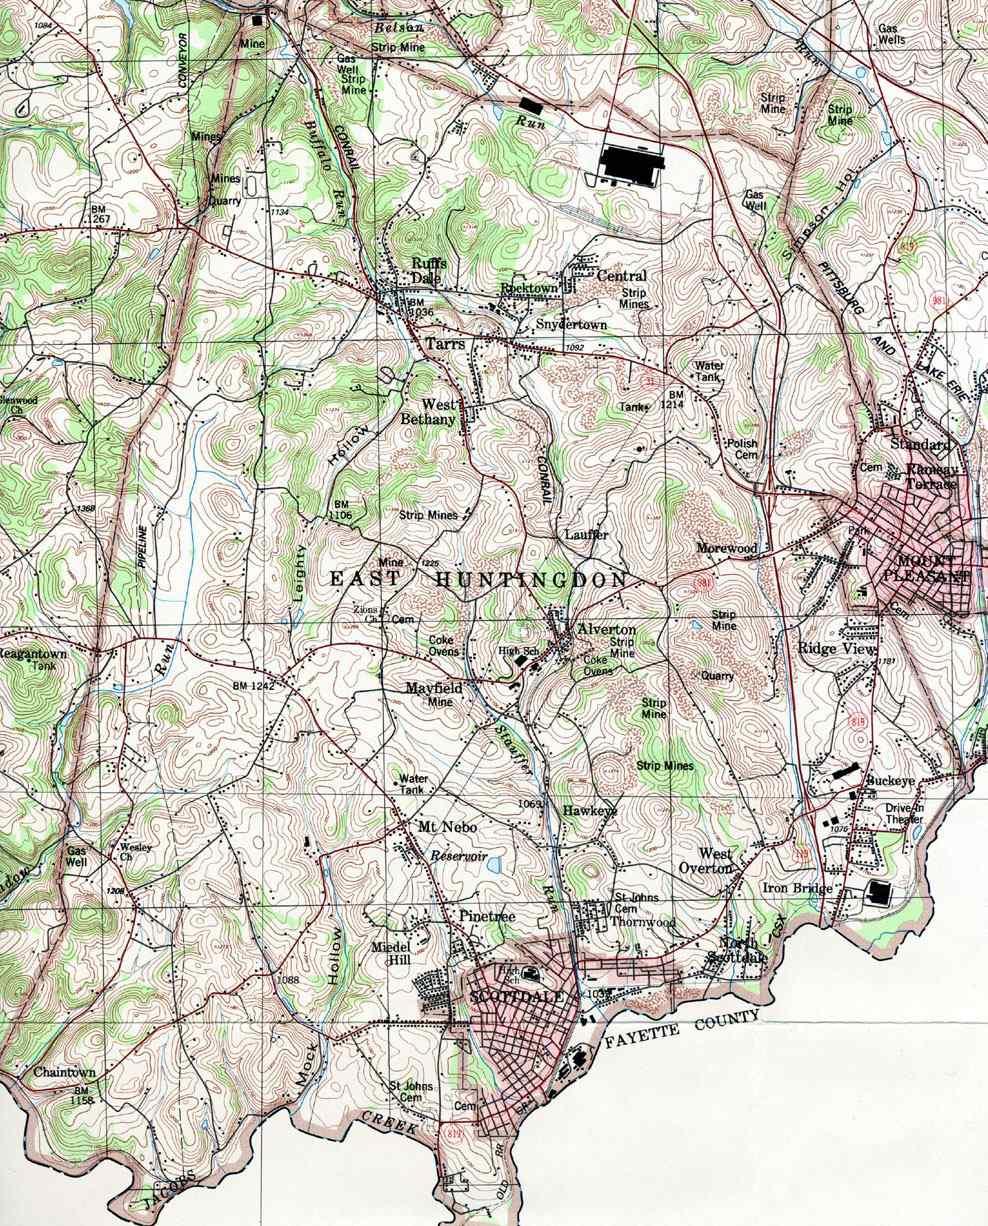 Westmoreland County Pennsylvania, Township Map on state of pa map, cowansville pa map, schuylkill river pa map, north strabane pa map, baldwin pa map, manns choice pa map, york pa map, centre hall pa map, huntingdon valley pa map, emporium pa map, bear rocks pa map, bucks co pa map, south hills pa map, karns city pa map, barkeyville pa map, red land pa map, hilliards pa map, greensburg pa map, rosslyn farms pa map, east pittsburgh pa map,